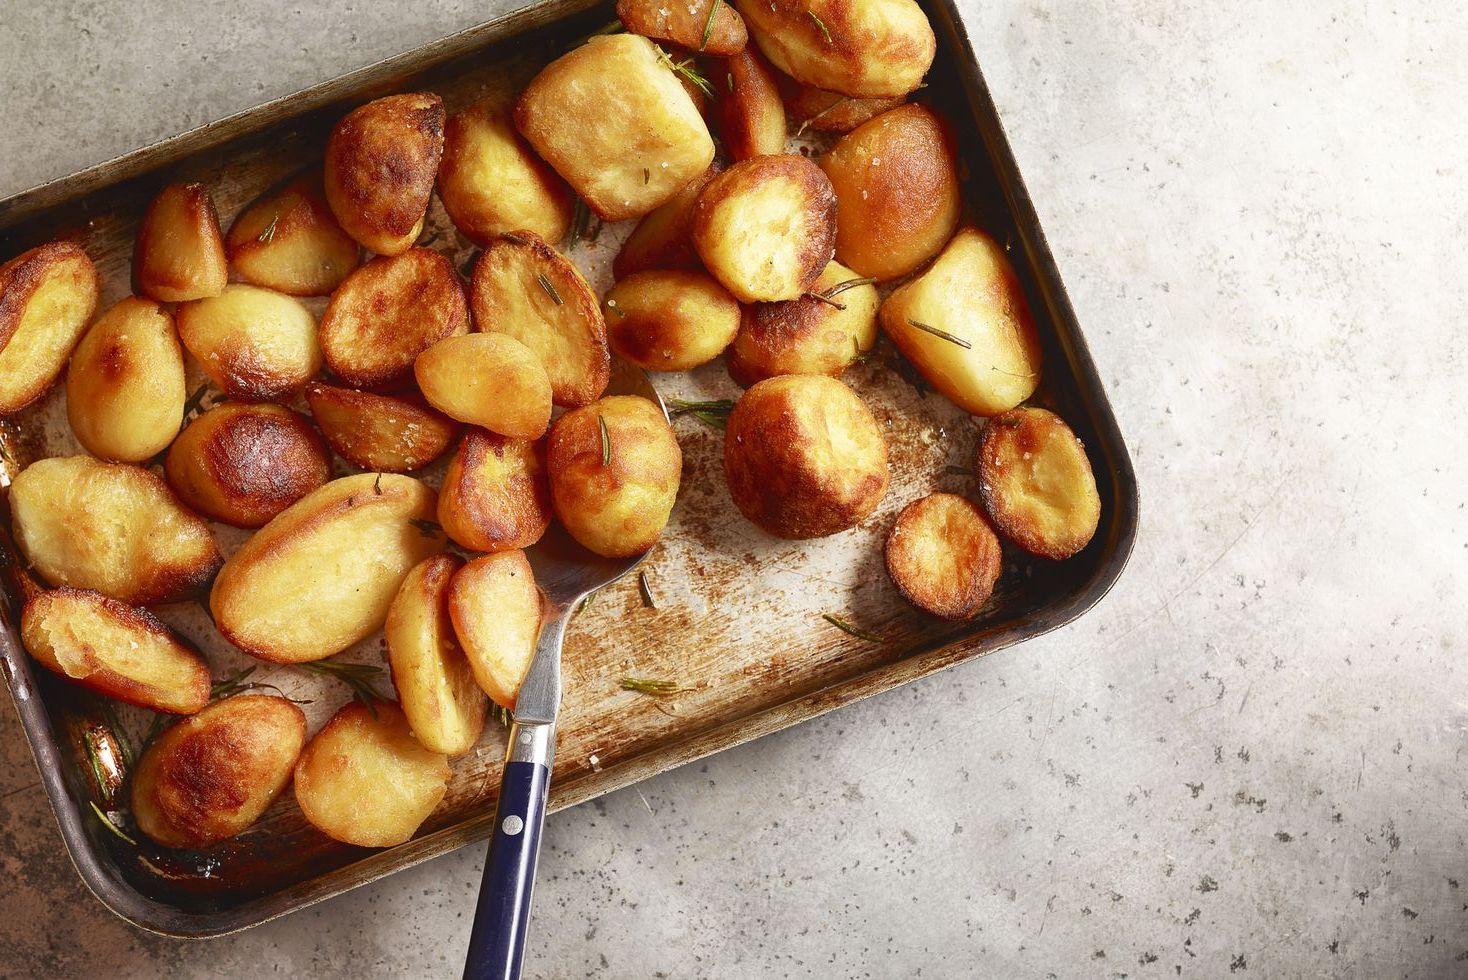 How To Roast Potatoes Easy Roasted Potato Recipe